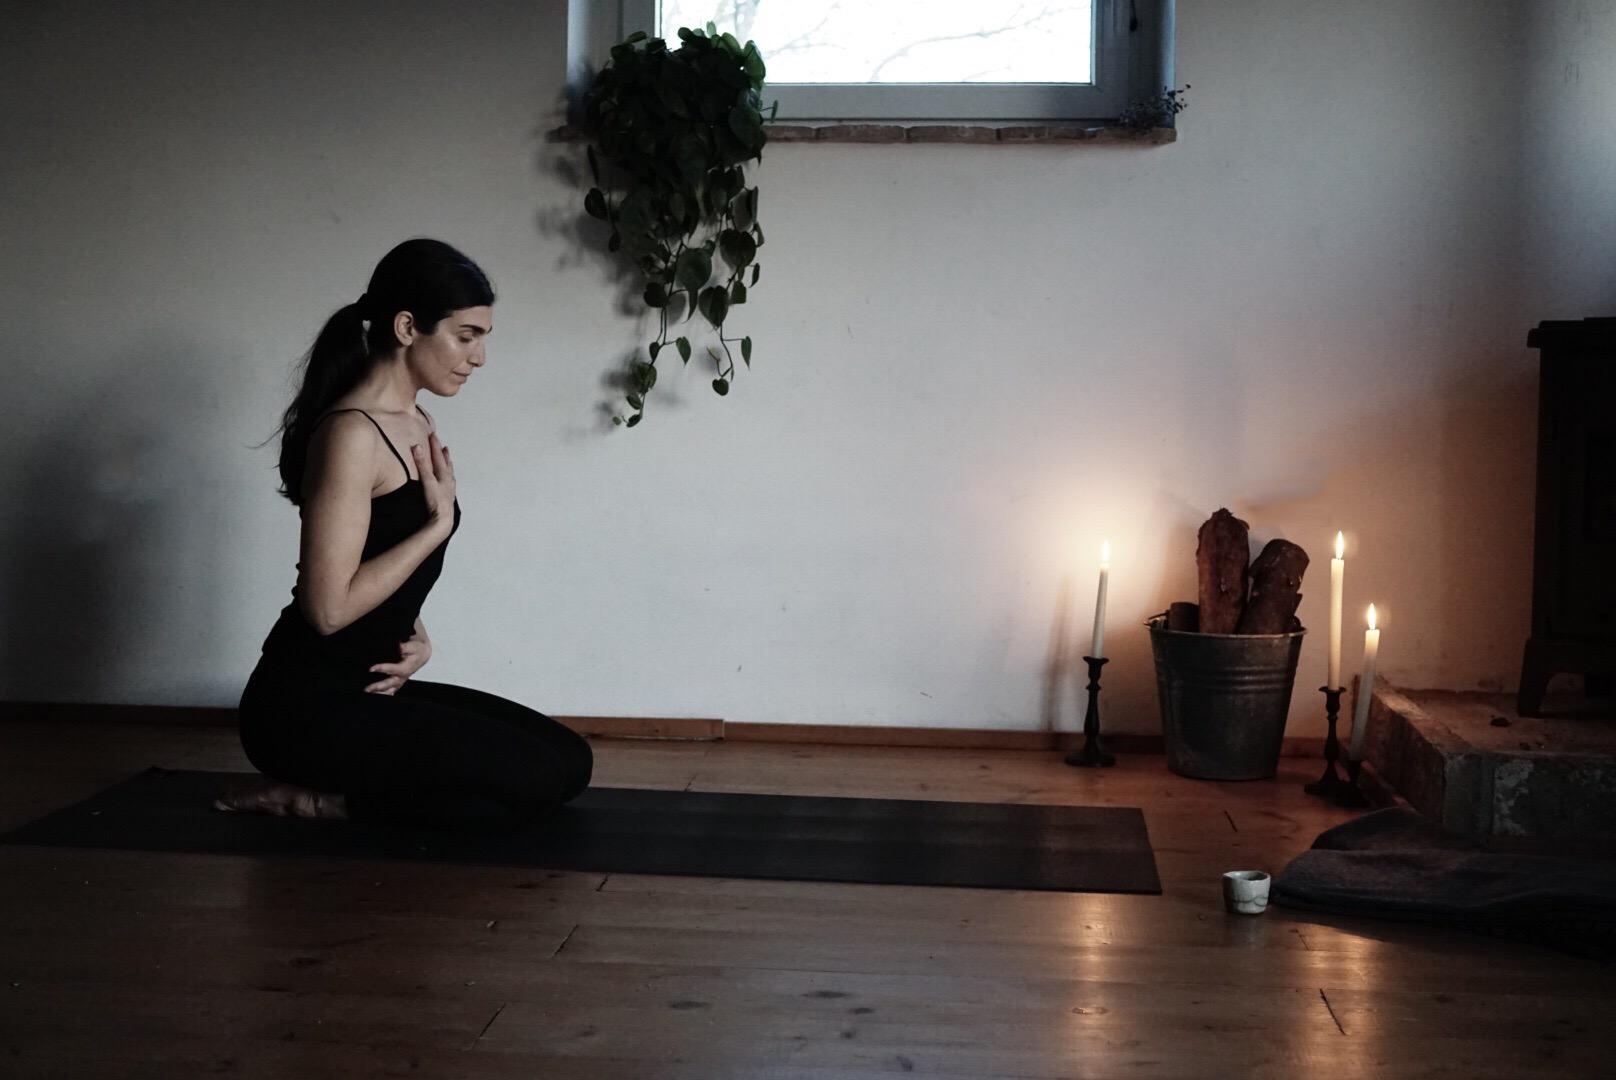 La Vita Yoga - la pratica yoga_ pranayama e meditazione